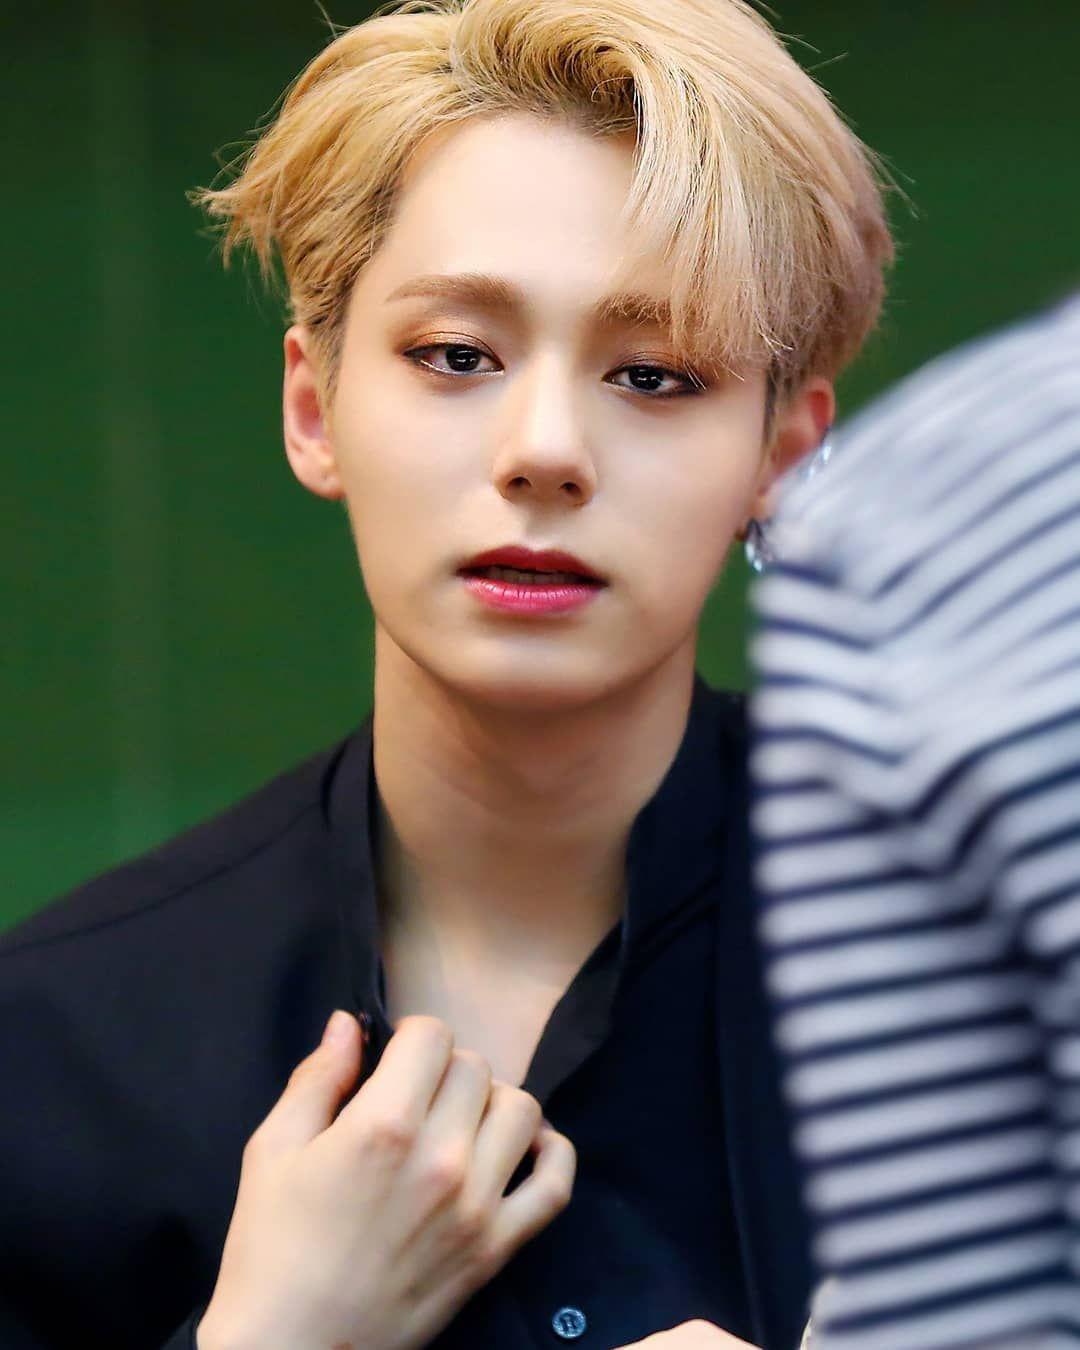 Pin By Vivi On Oneus Korean Idol Vocalist Boy Bands